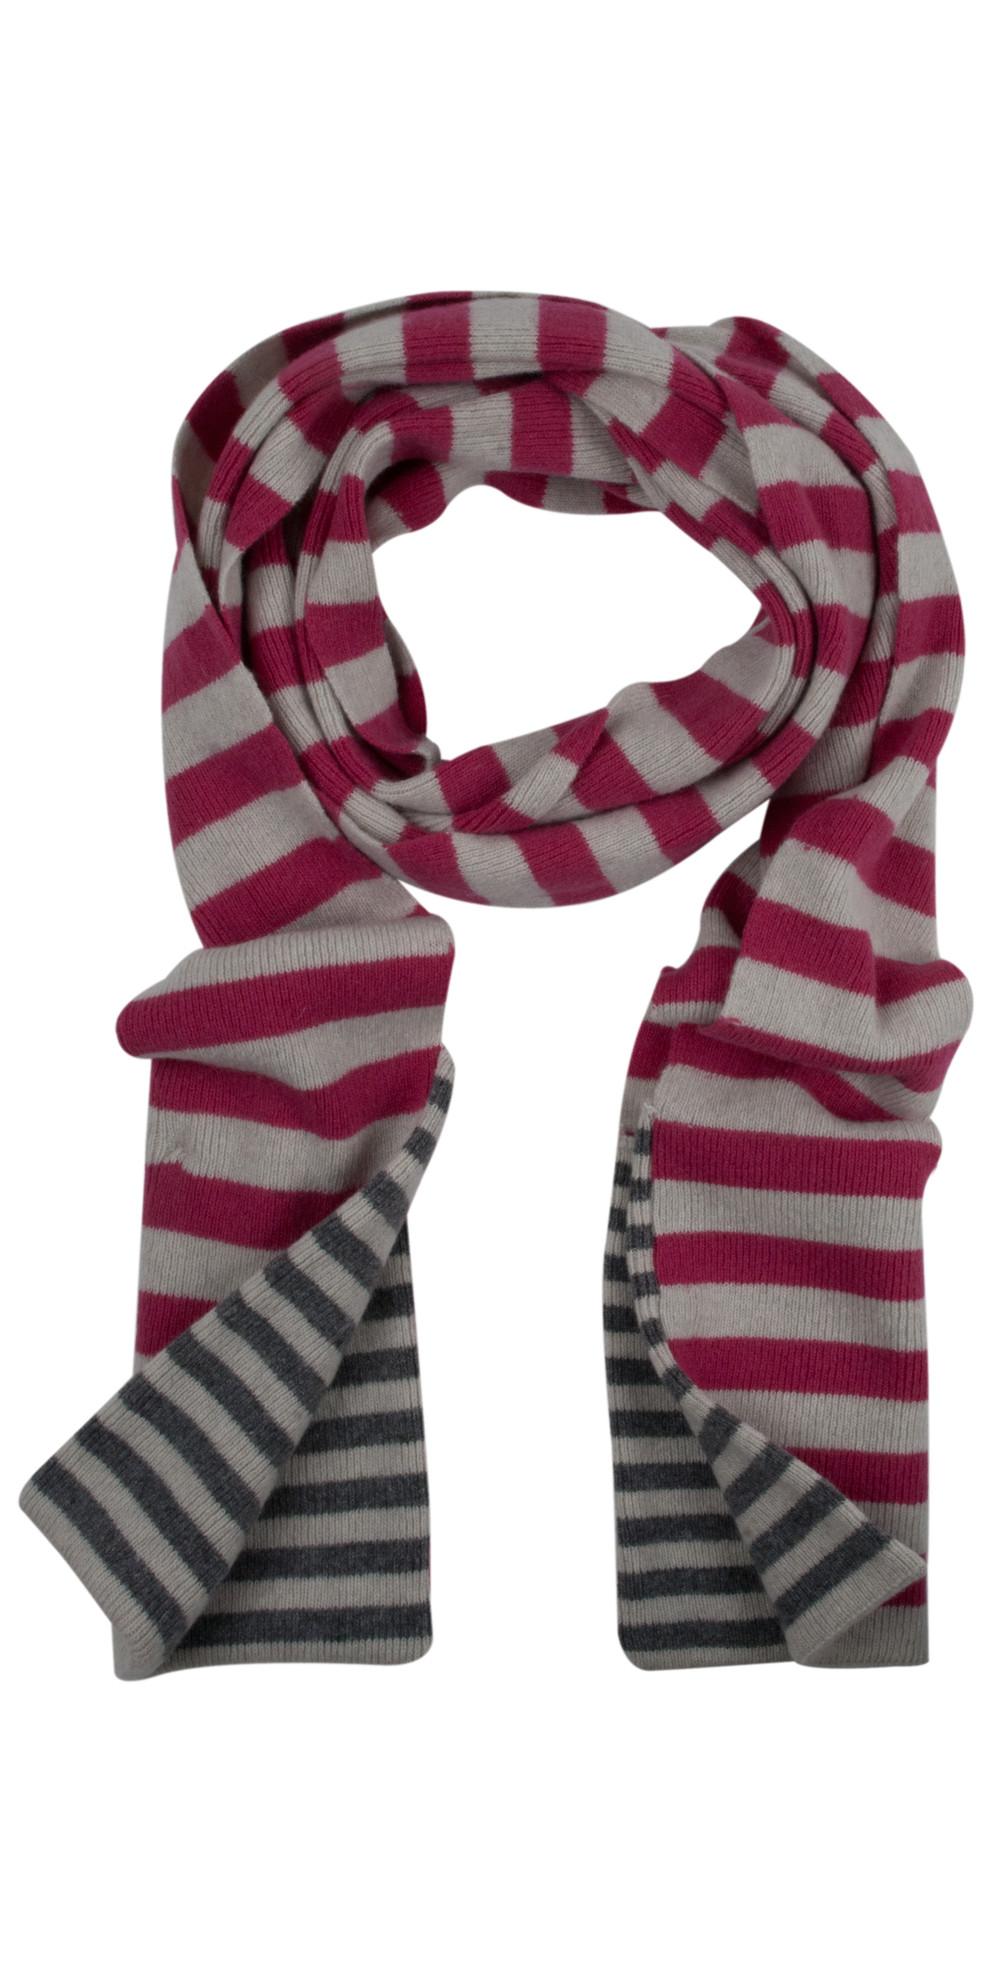 seasalt clothing novelty scarf in ripple